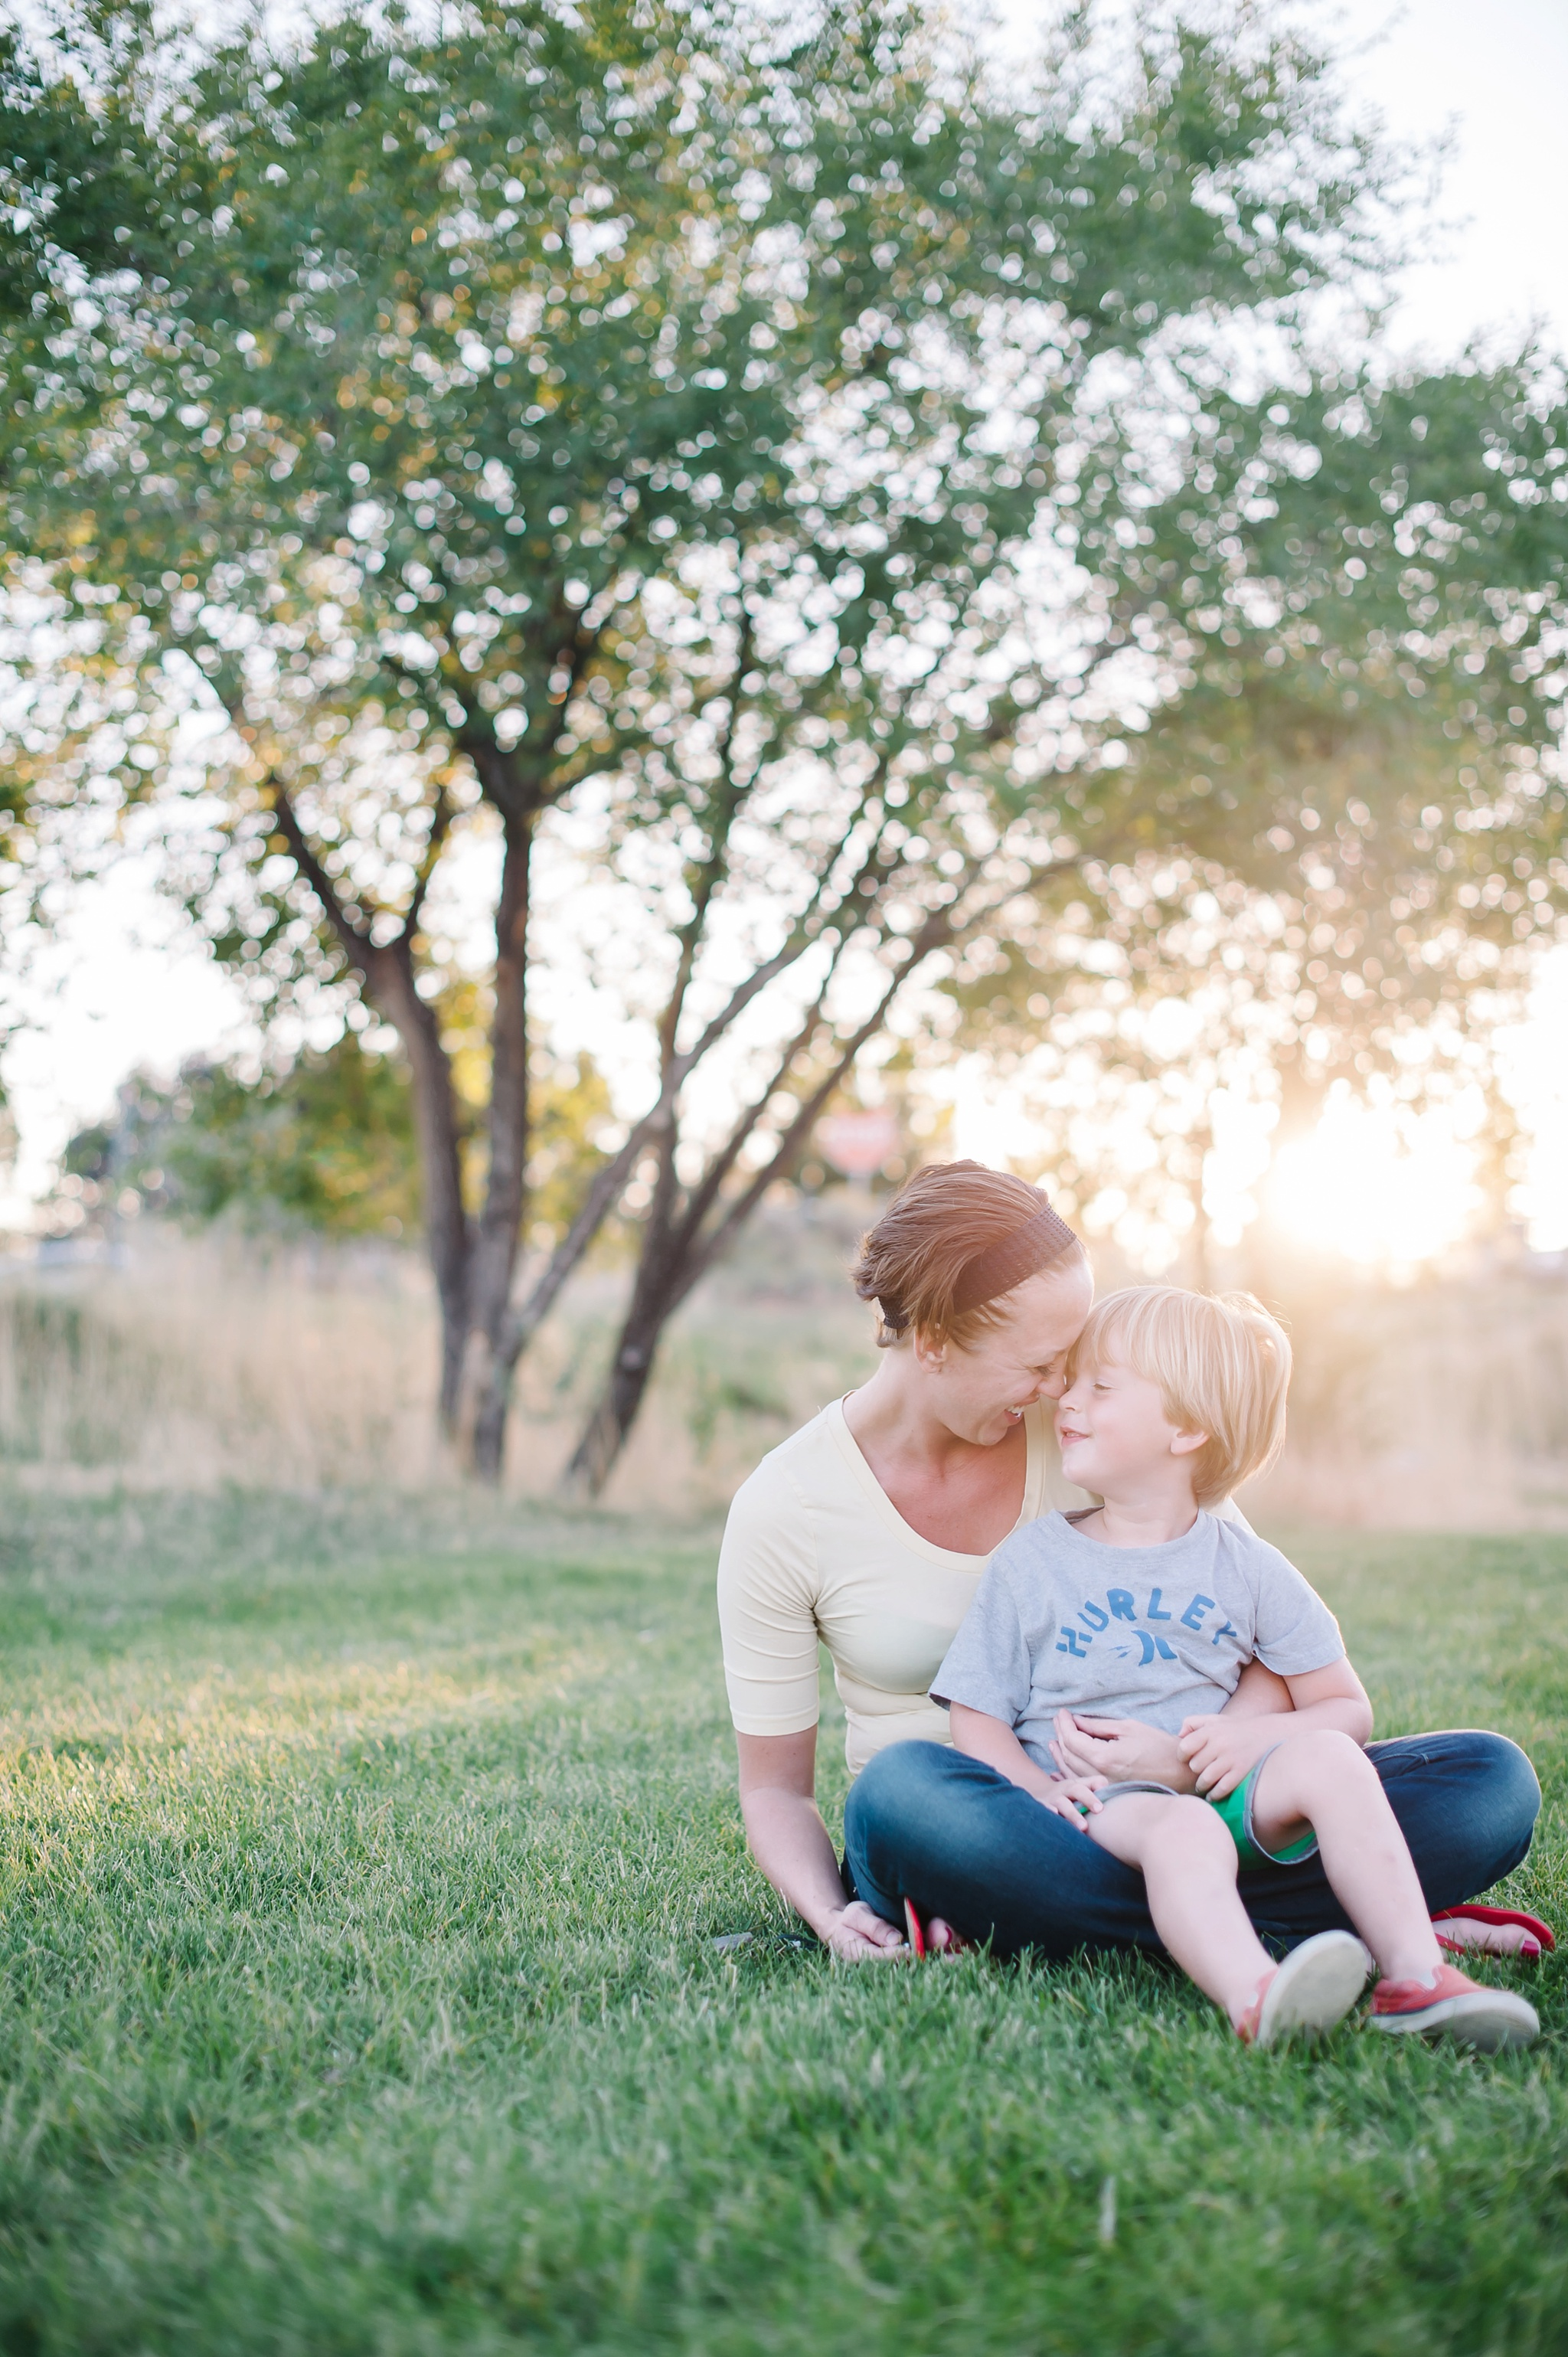 Utah Salt Lake Family Photographer Ali Sumsion 014